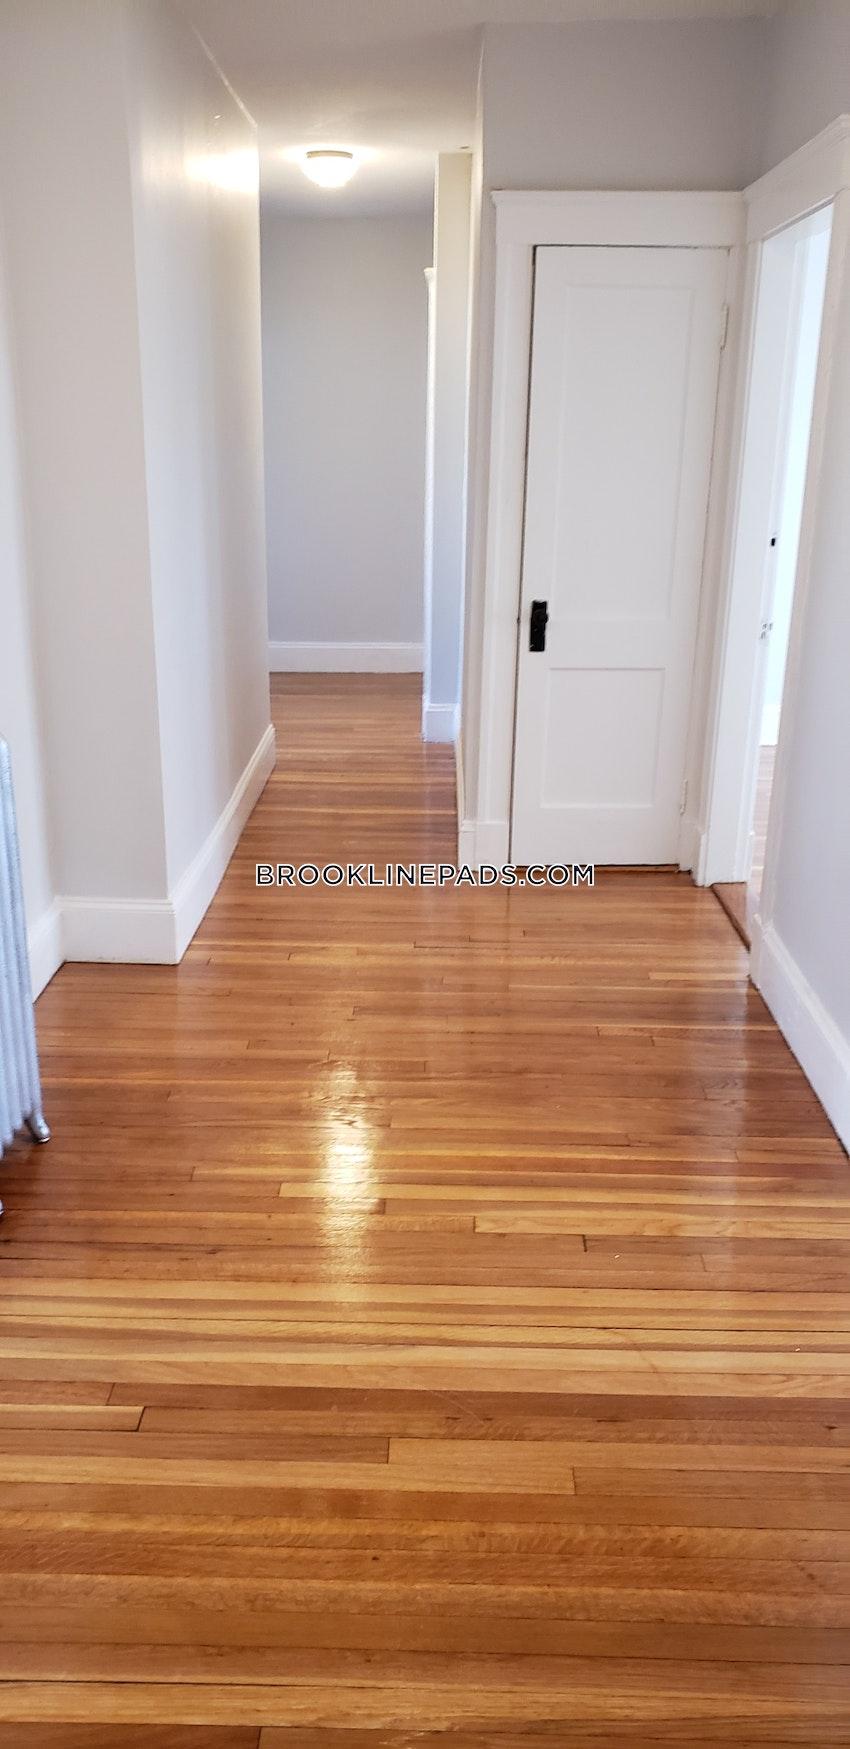 BROOKLINE- BOSTON UNIVERSITY - 4 Beds, 1.5 Baths - Image 16